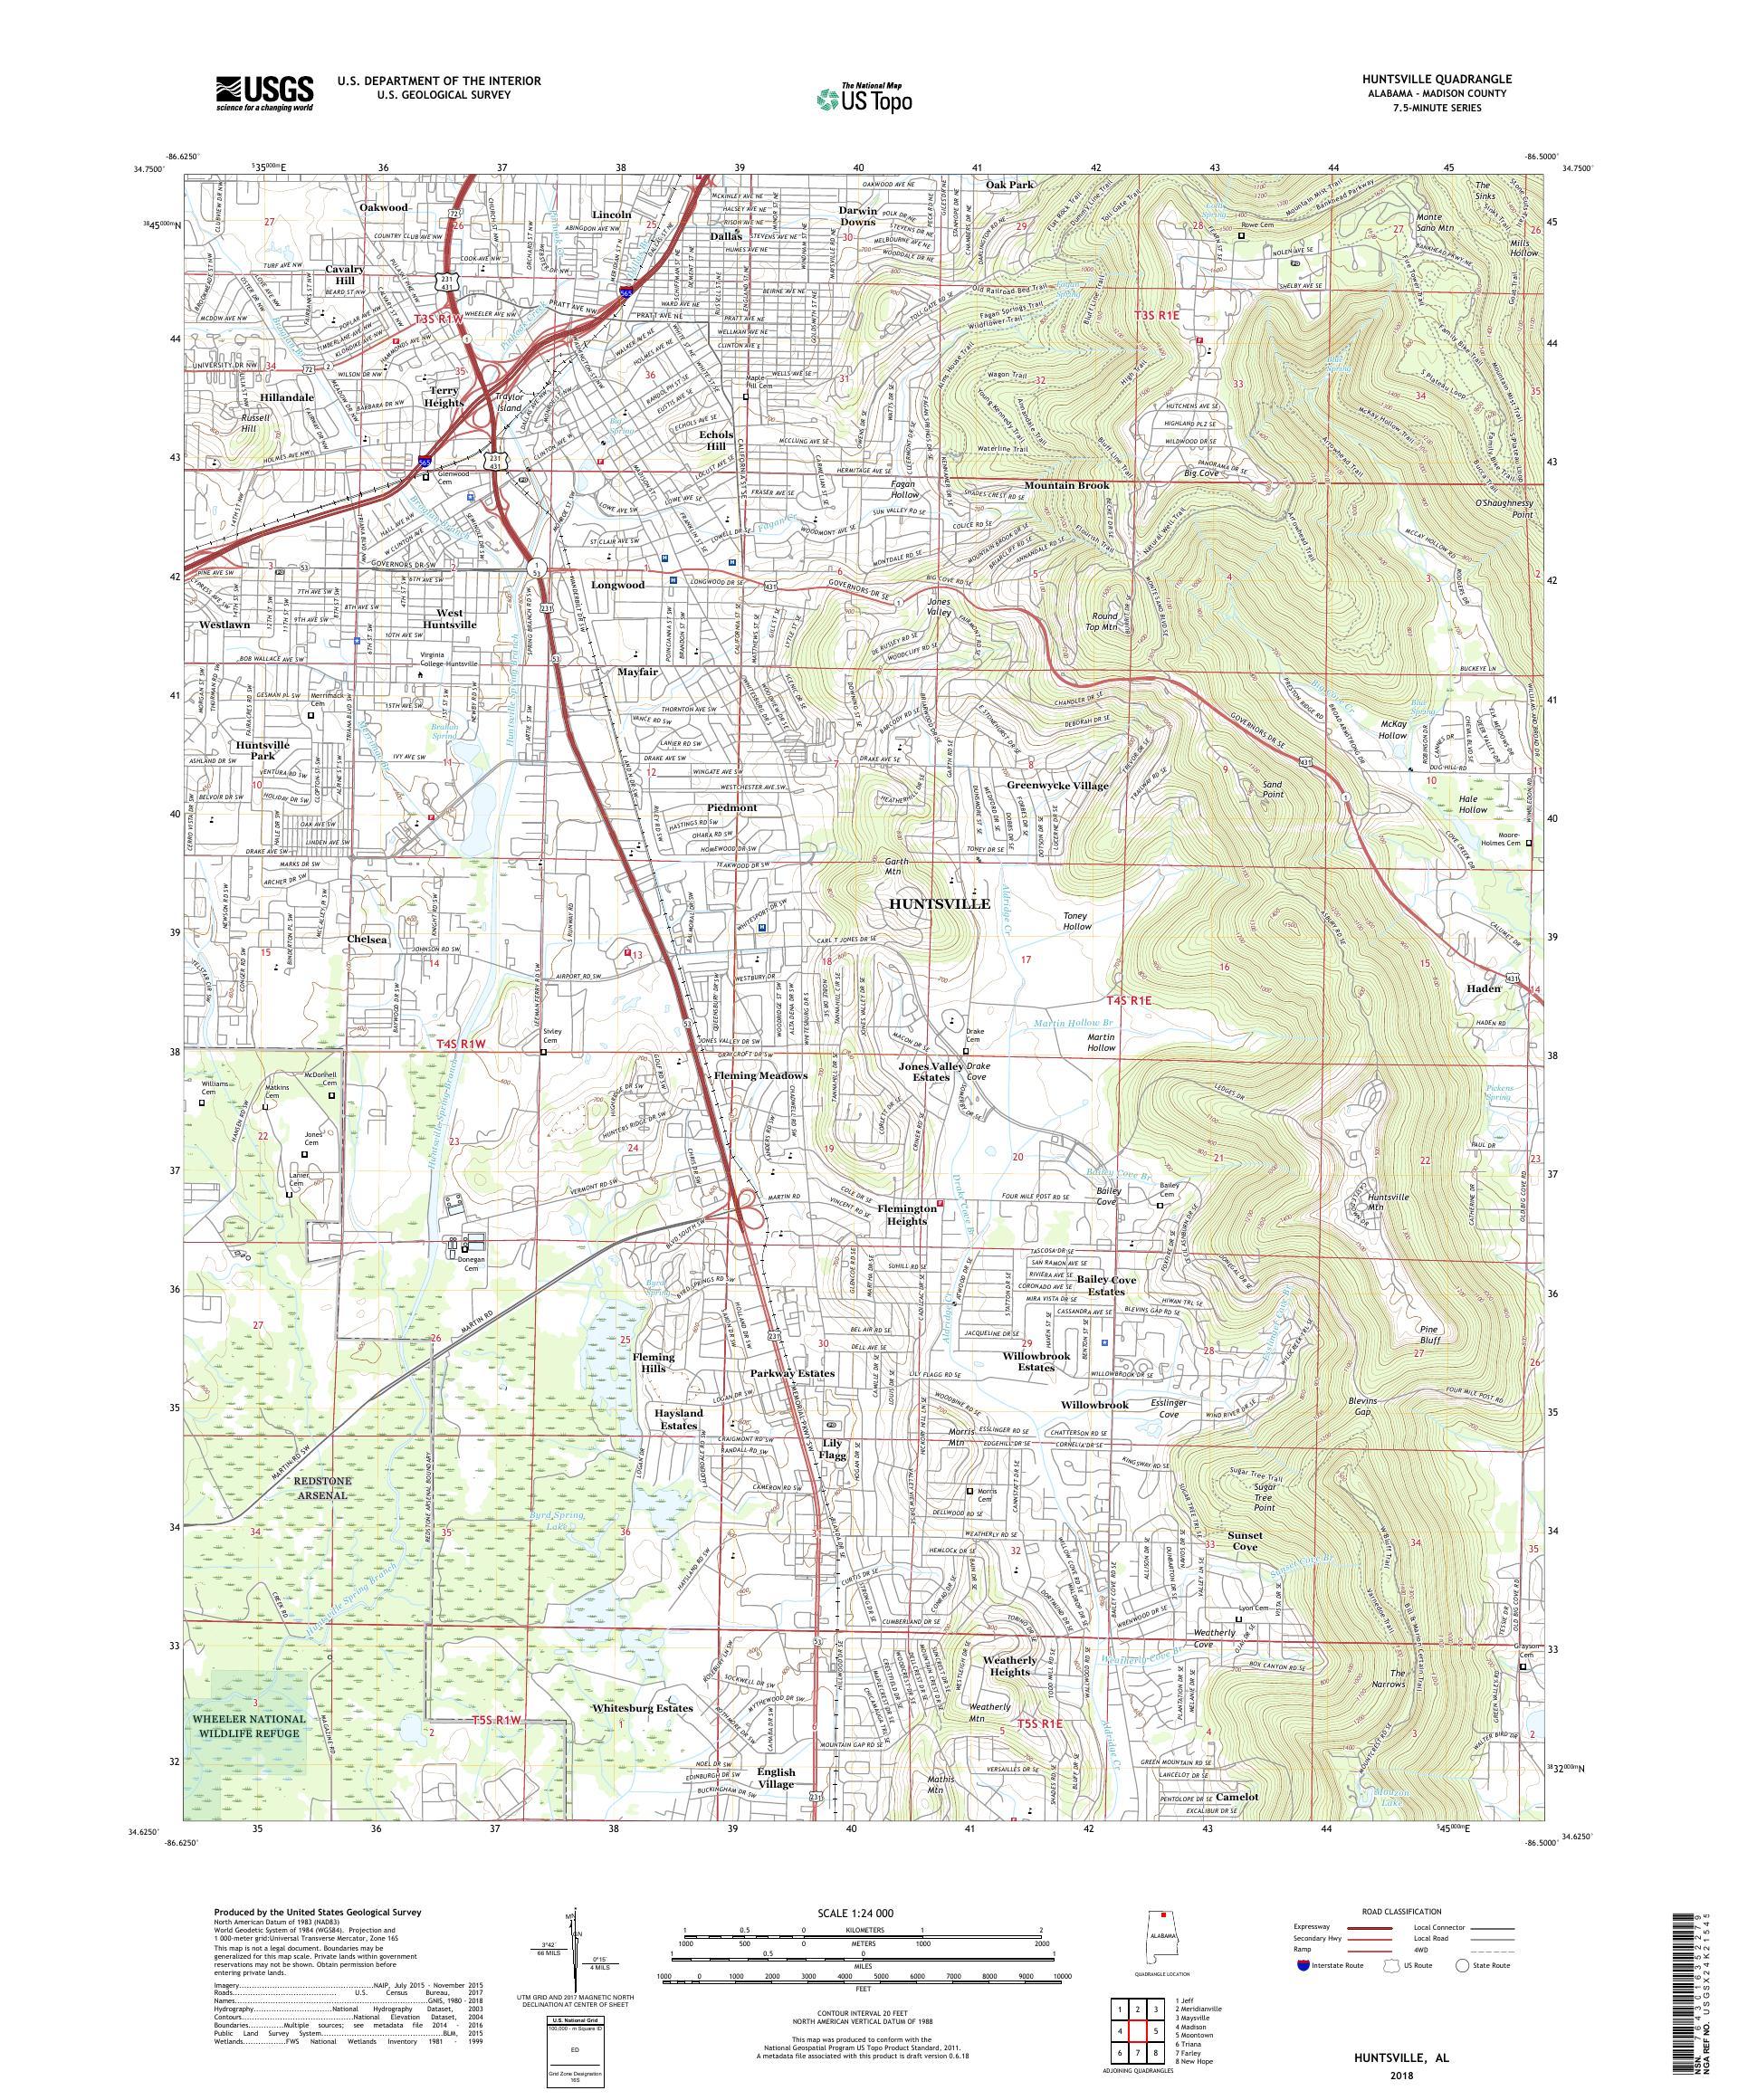 MyTopo Huntsville, Alabama USGS Quad Topo Map